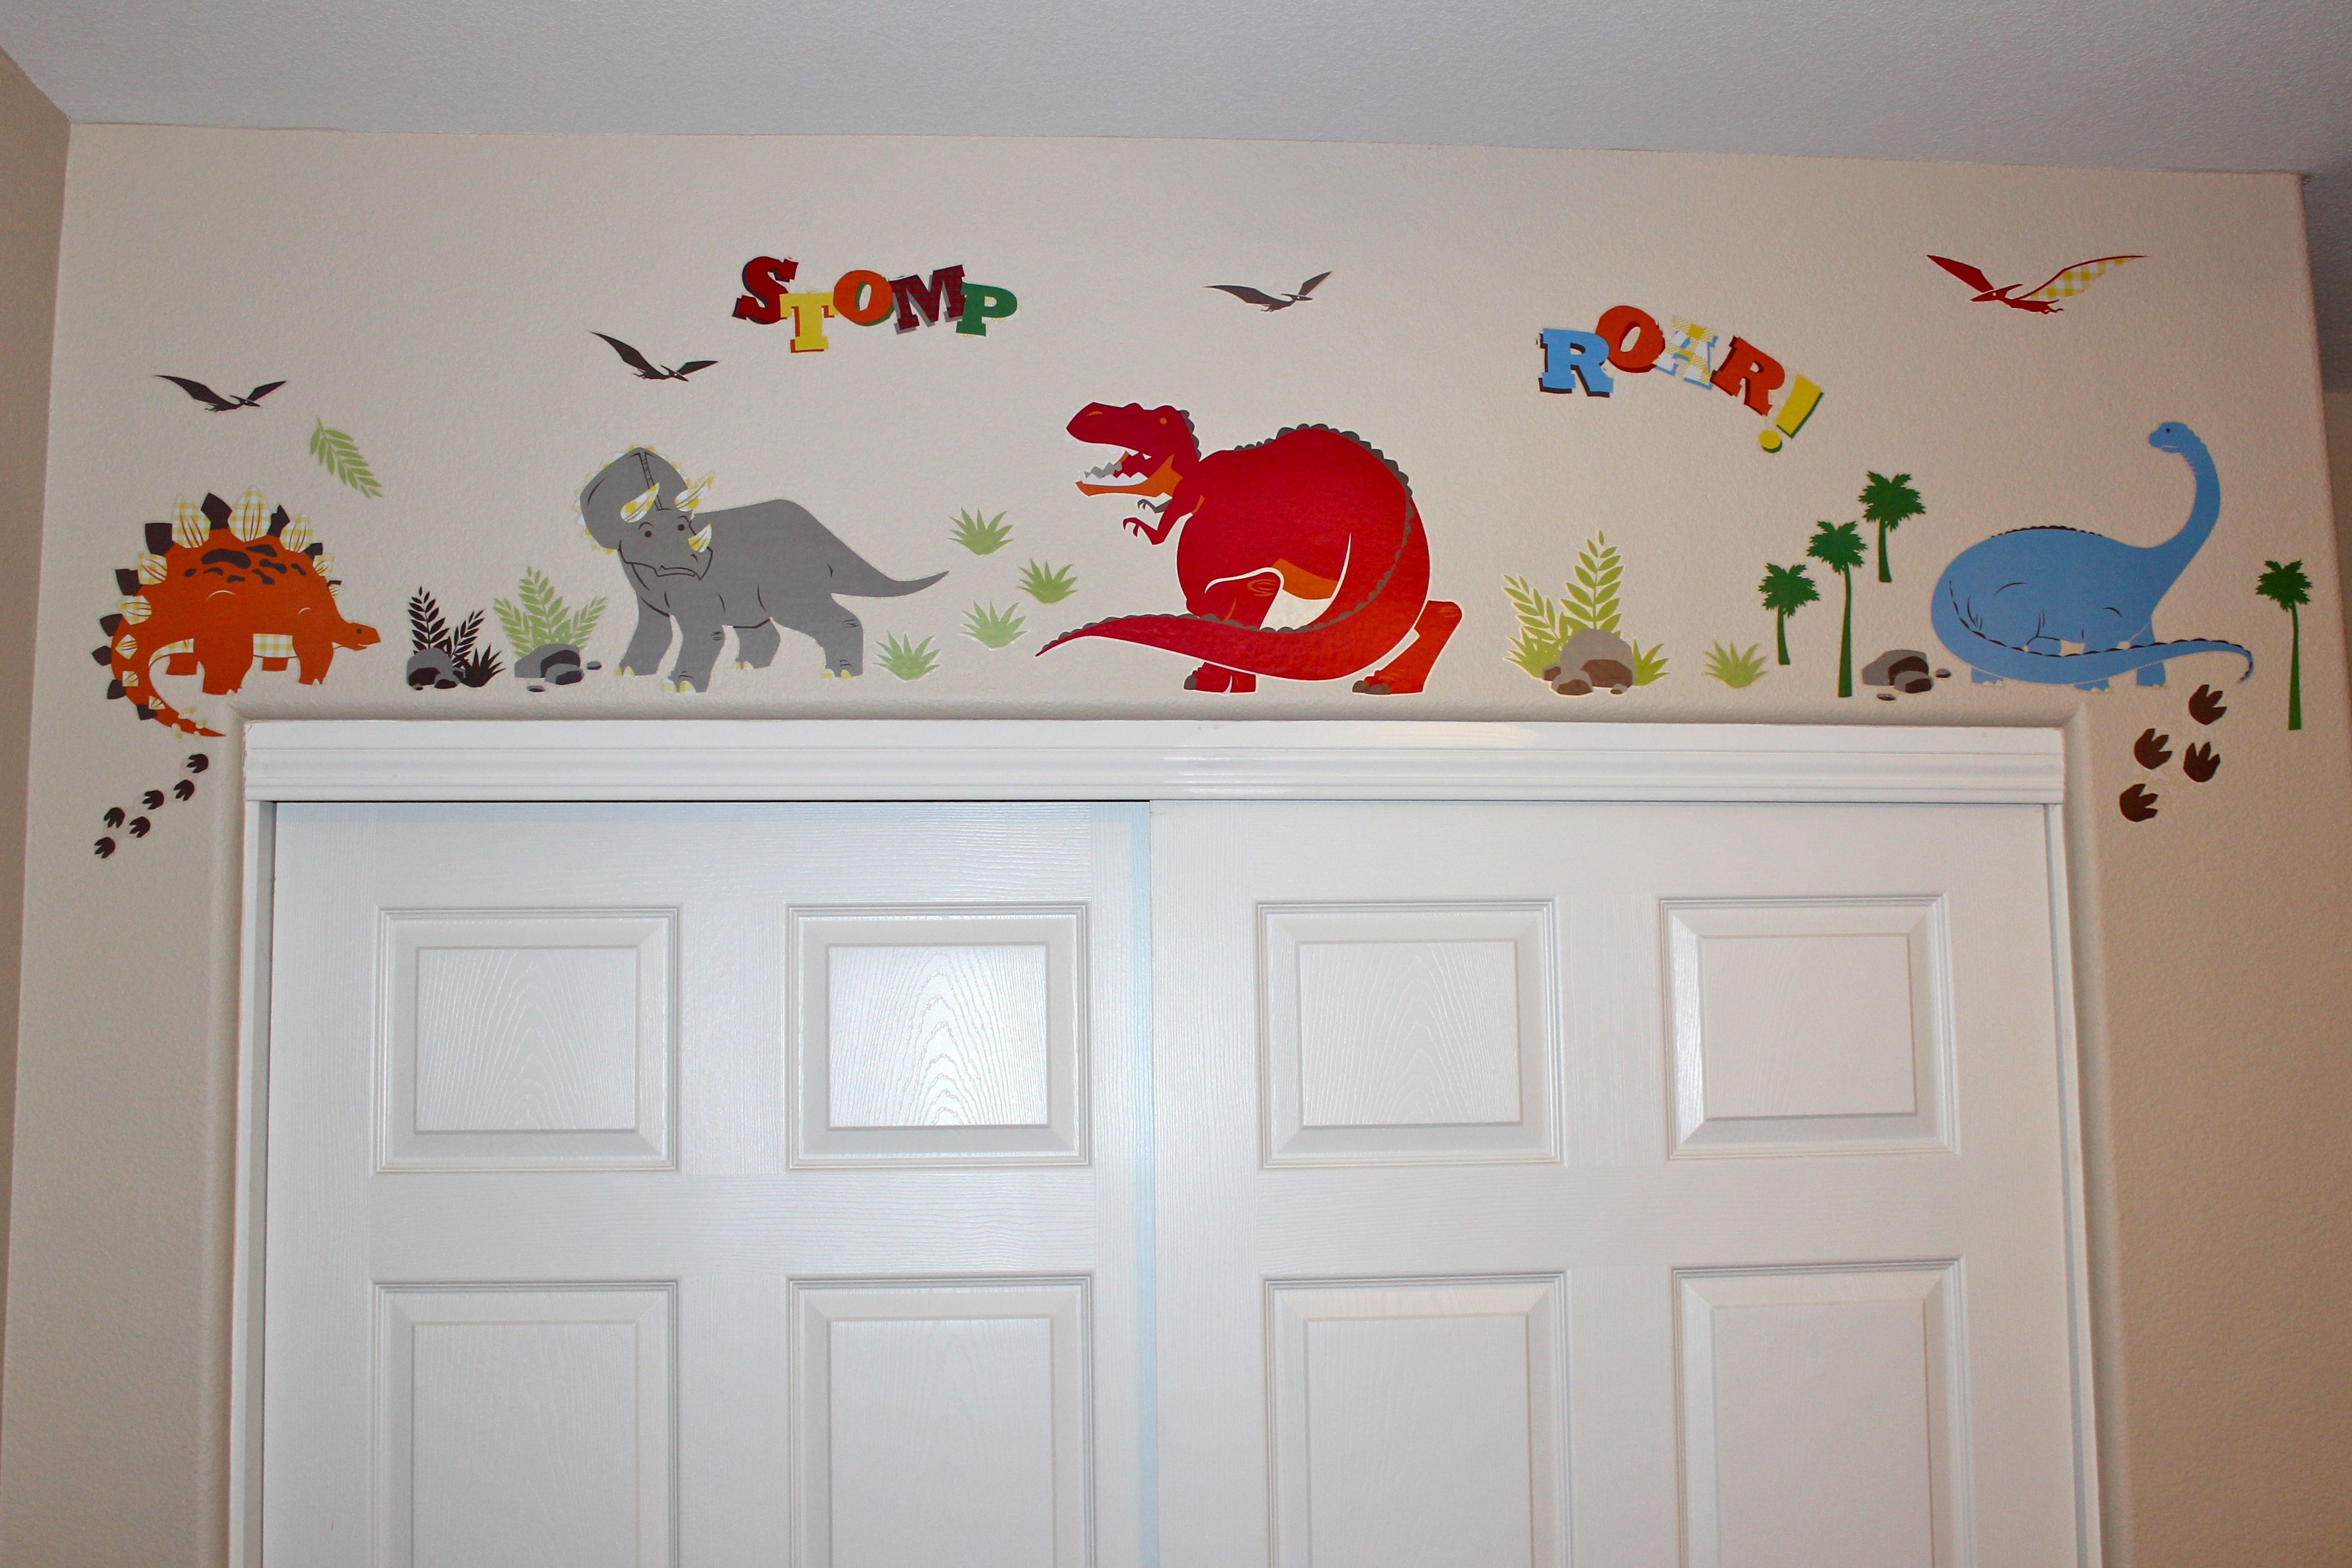 dinosaur wall decals from target big boy room ideas. Black Bedroom Furniture Sets. Home Design Ideas